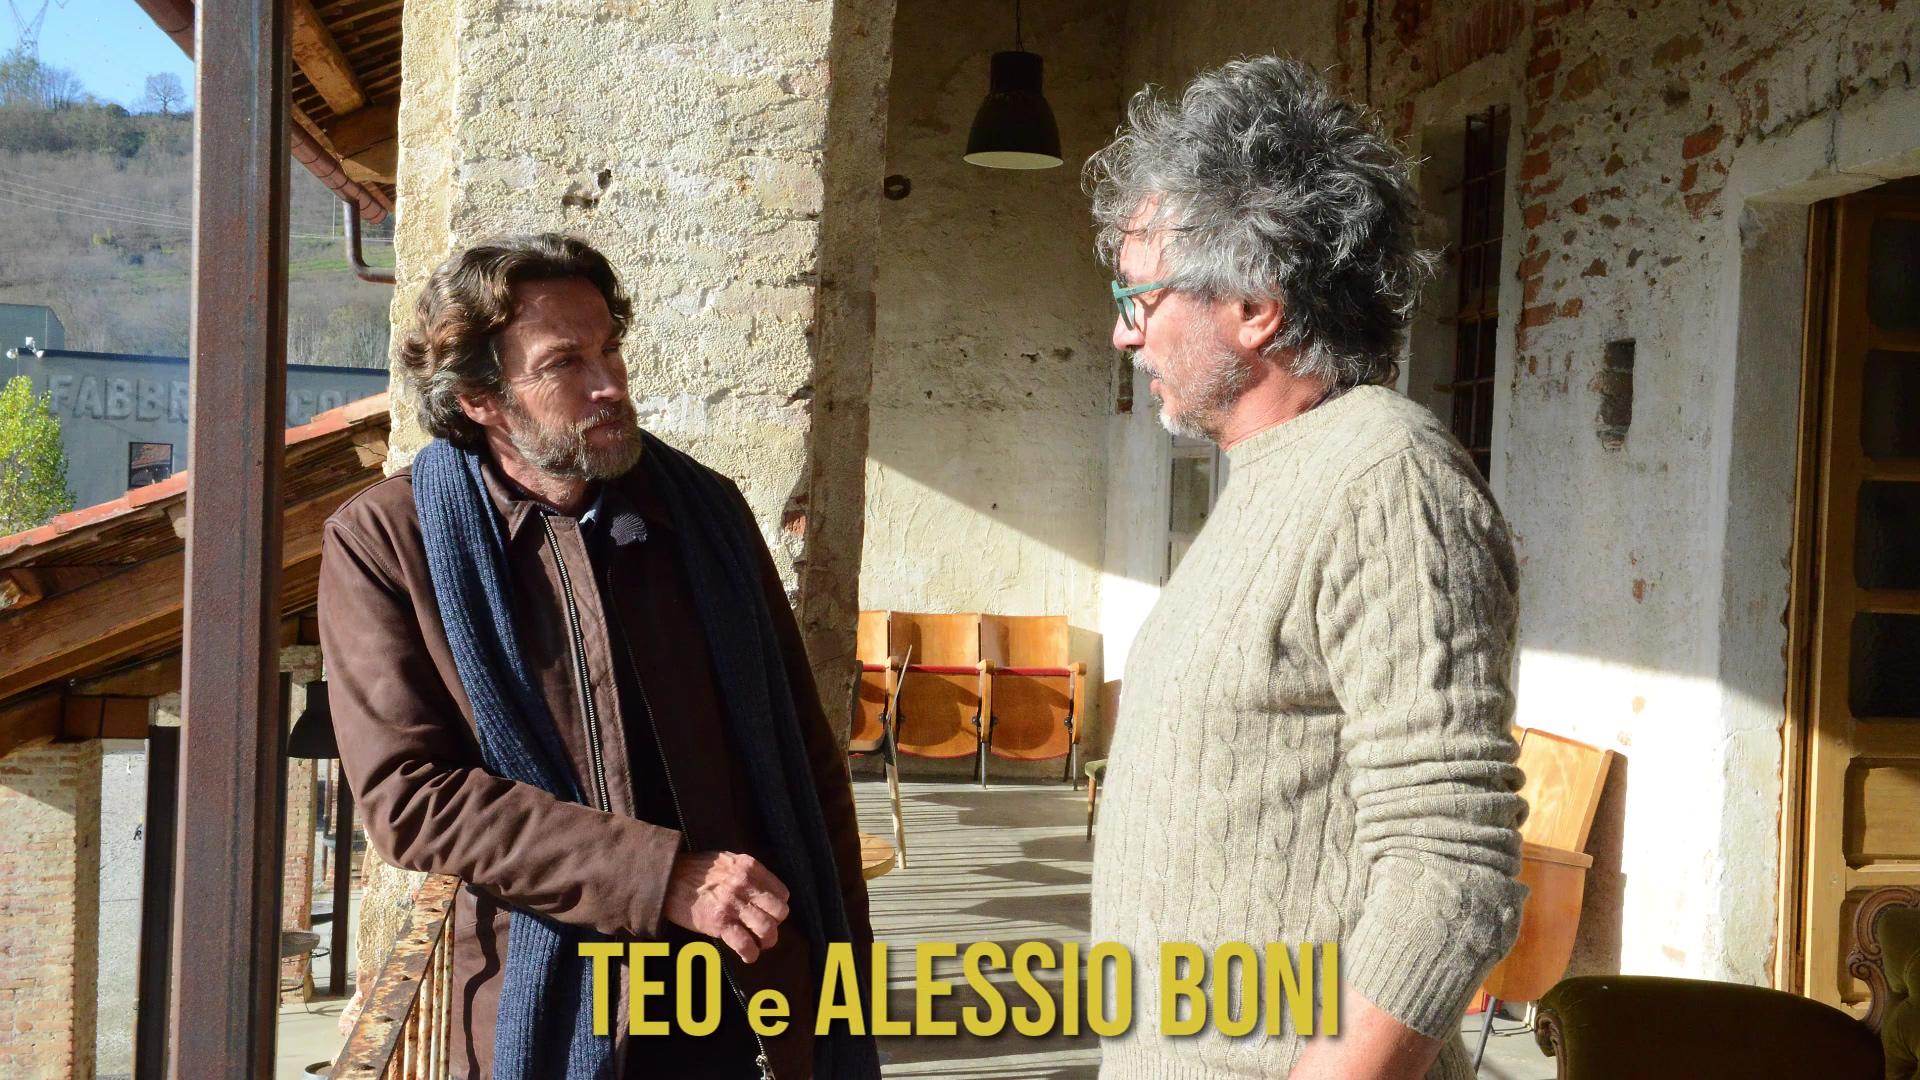 Teo+Alessio Boni